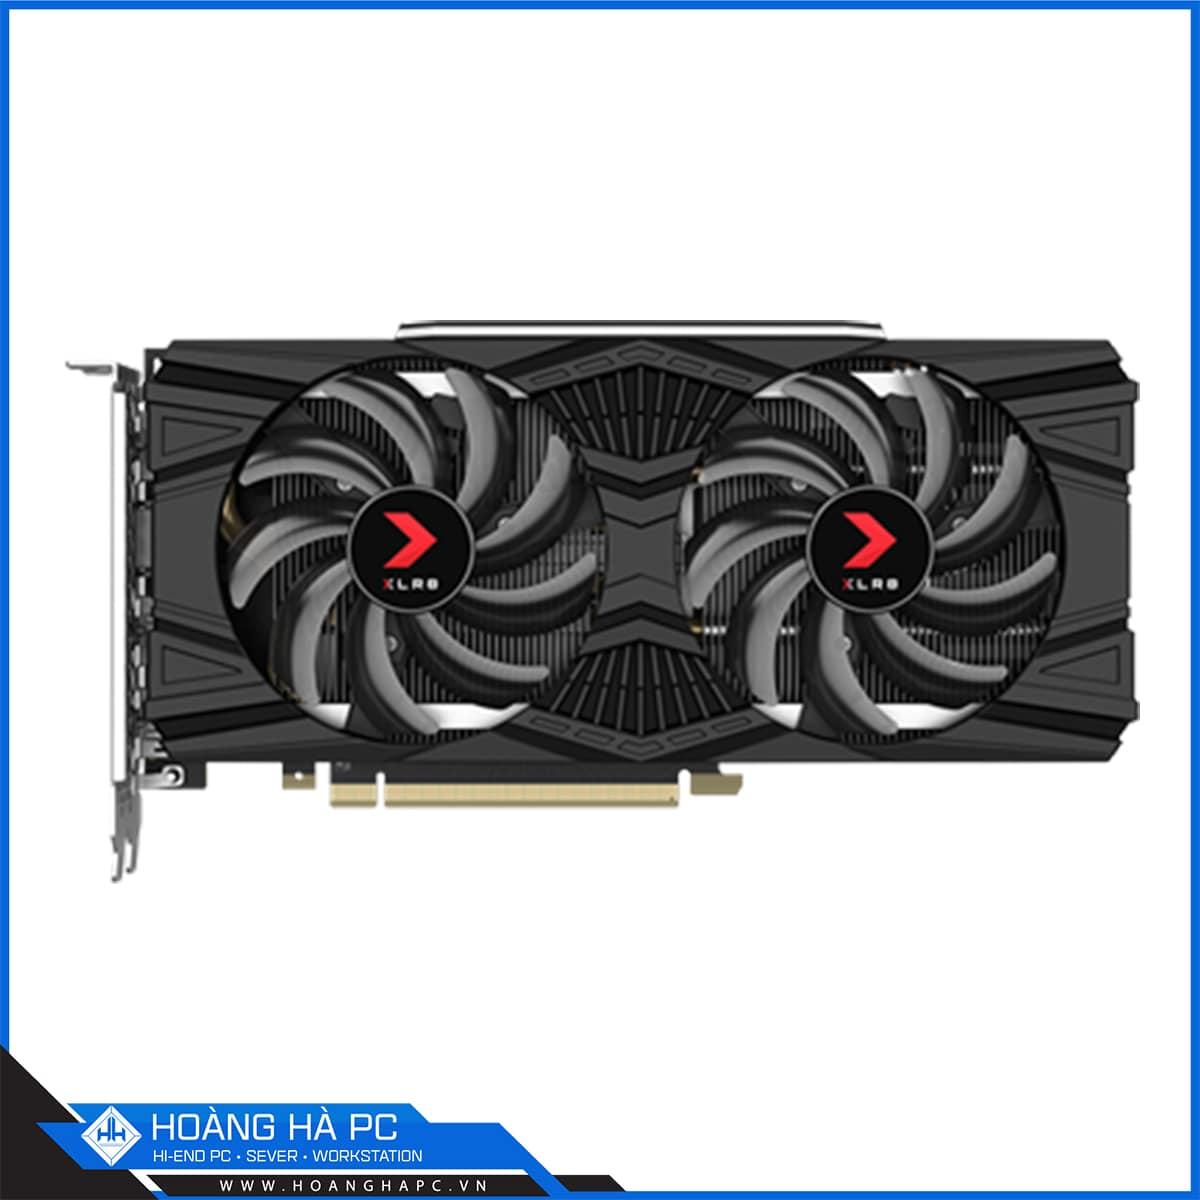 PNY GeForce RTX 2060 Super 8GB XLR8